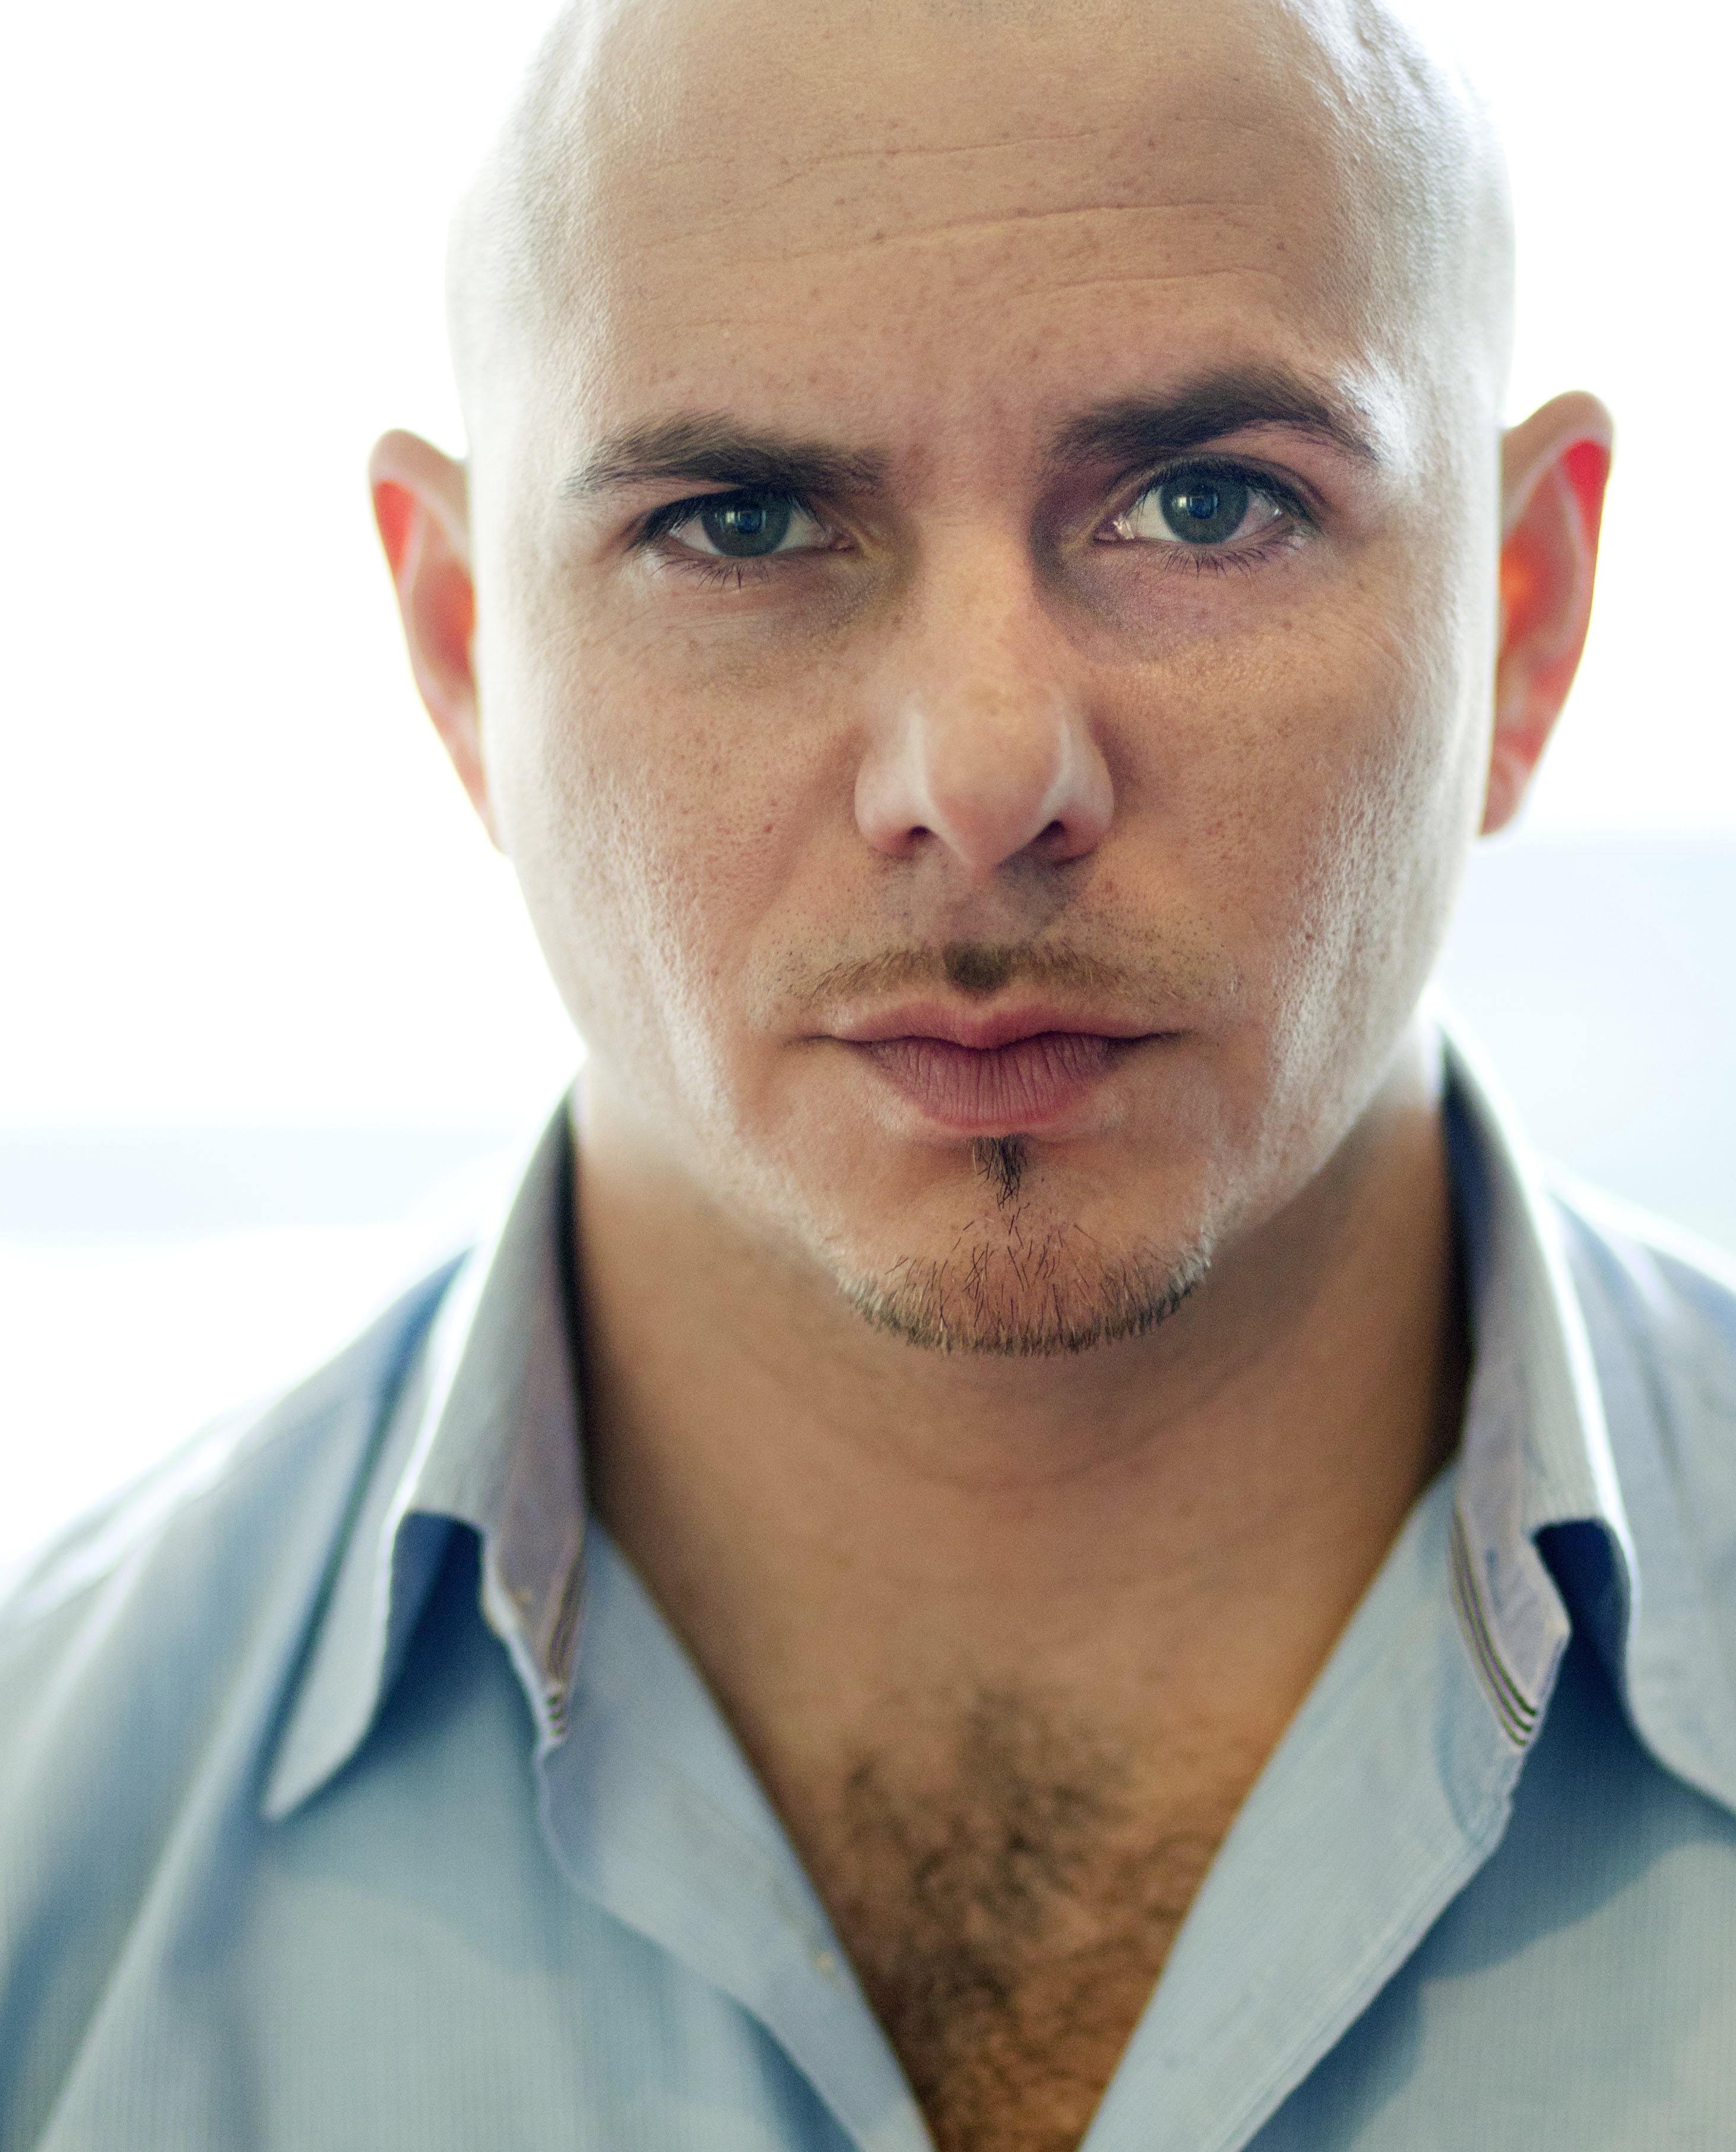 El rapero Pitbull posa para una fotografía en Los Angeles el miércoles 22 de junio de 2011. (Foto AP/Matt Sayles)